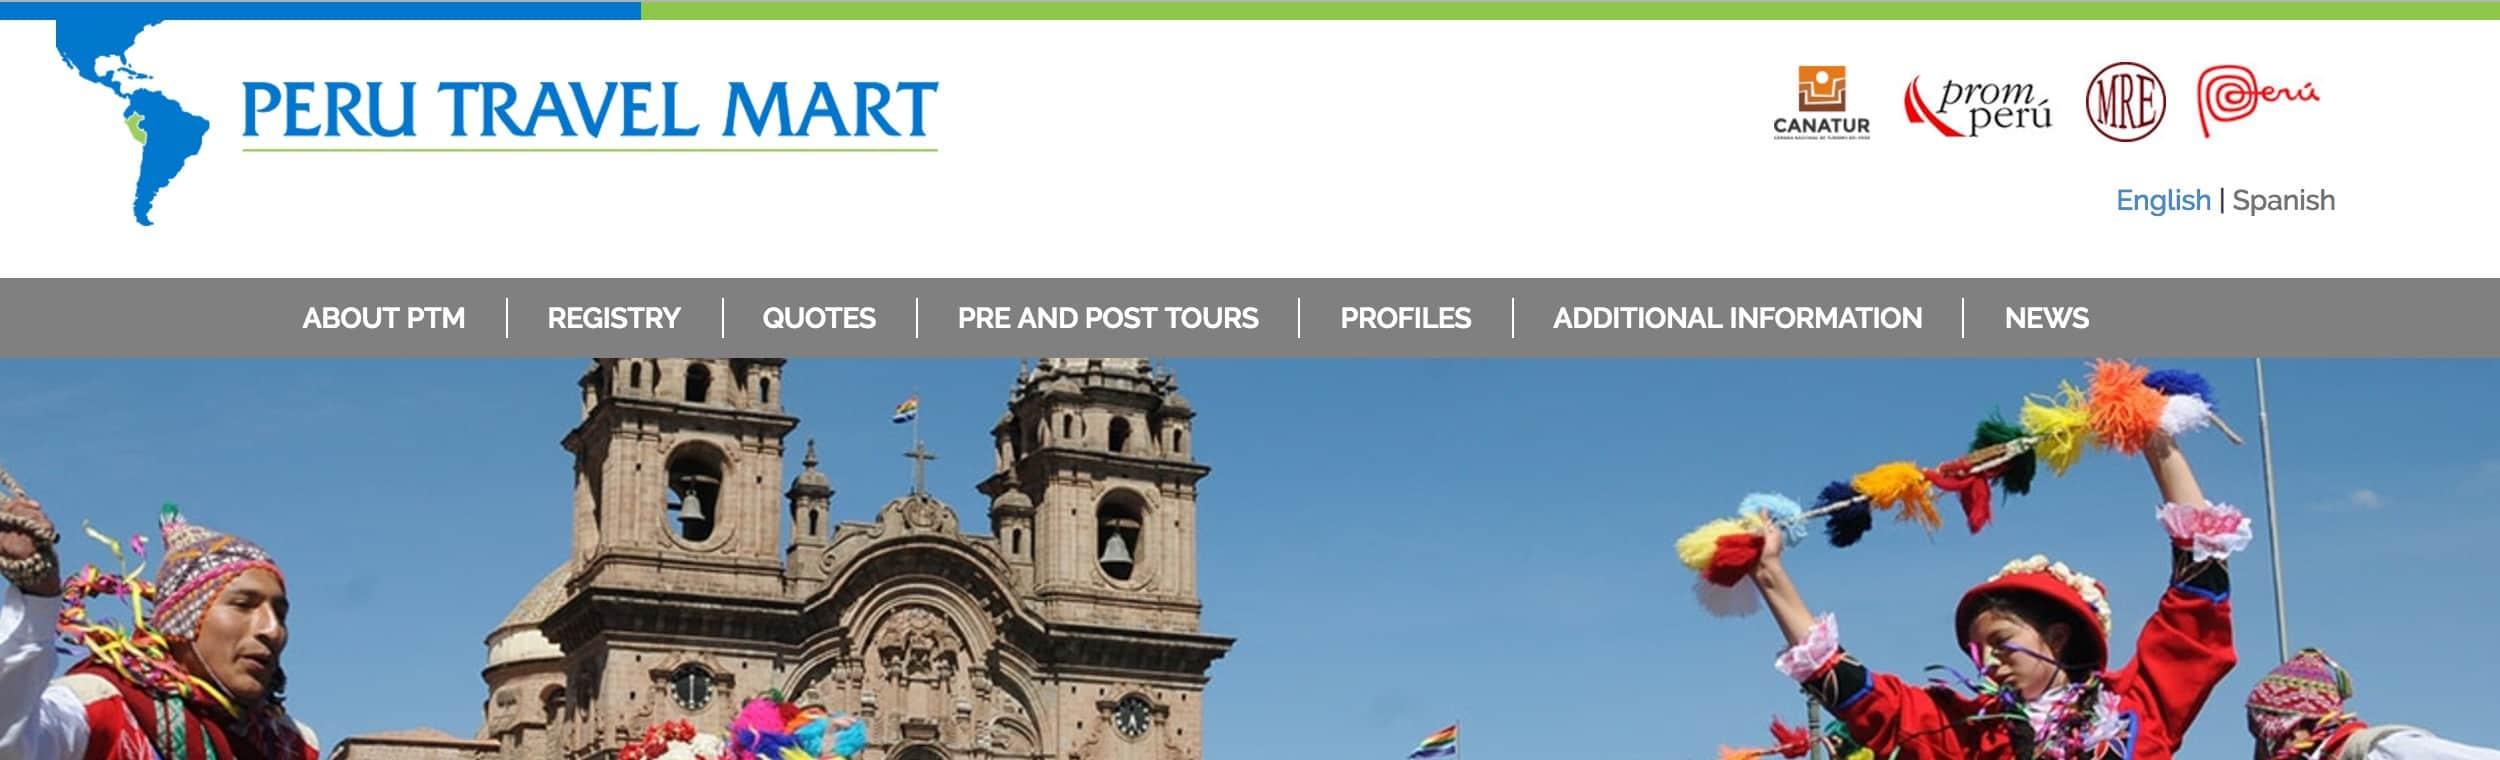 Peru Travel Mart